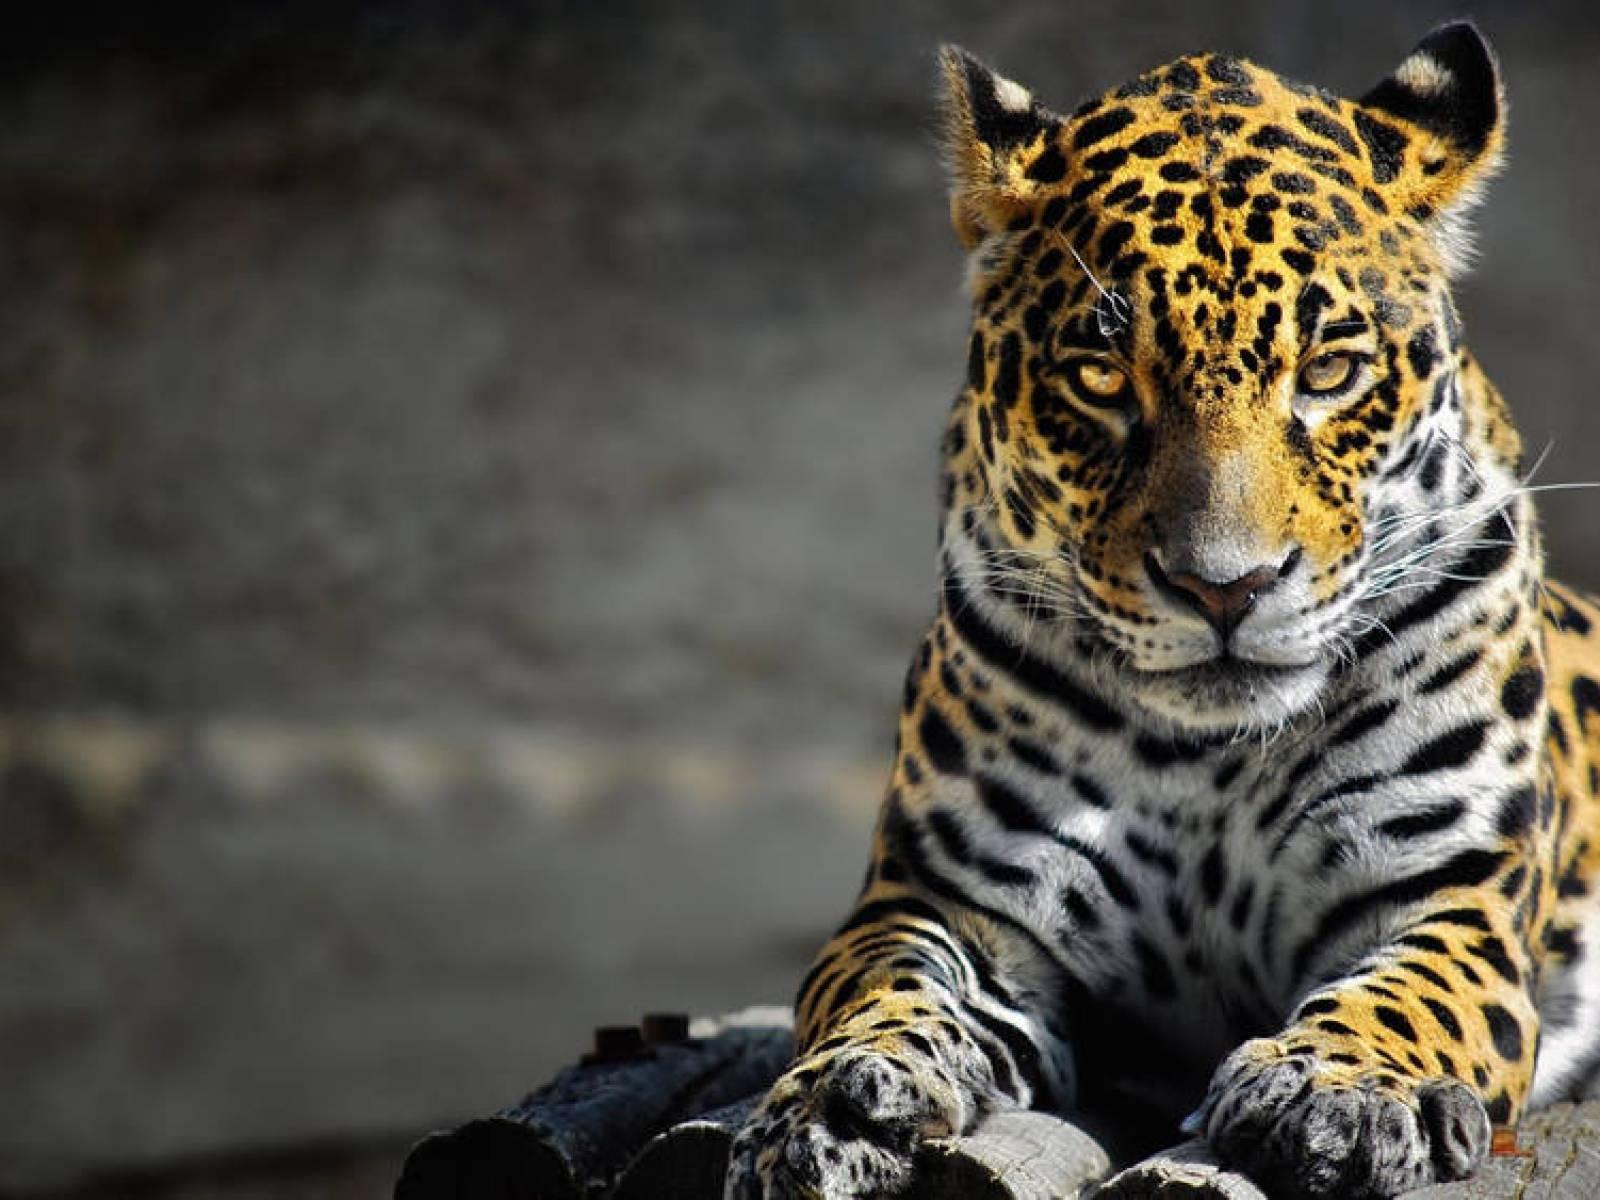 cat: relax white tiger sleep force beautiful cats desktop